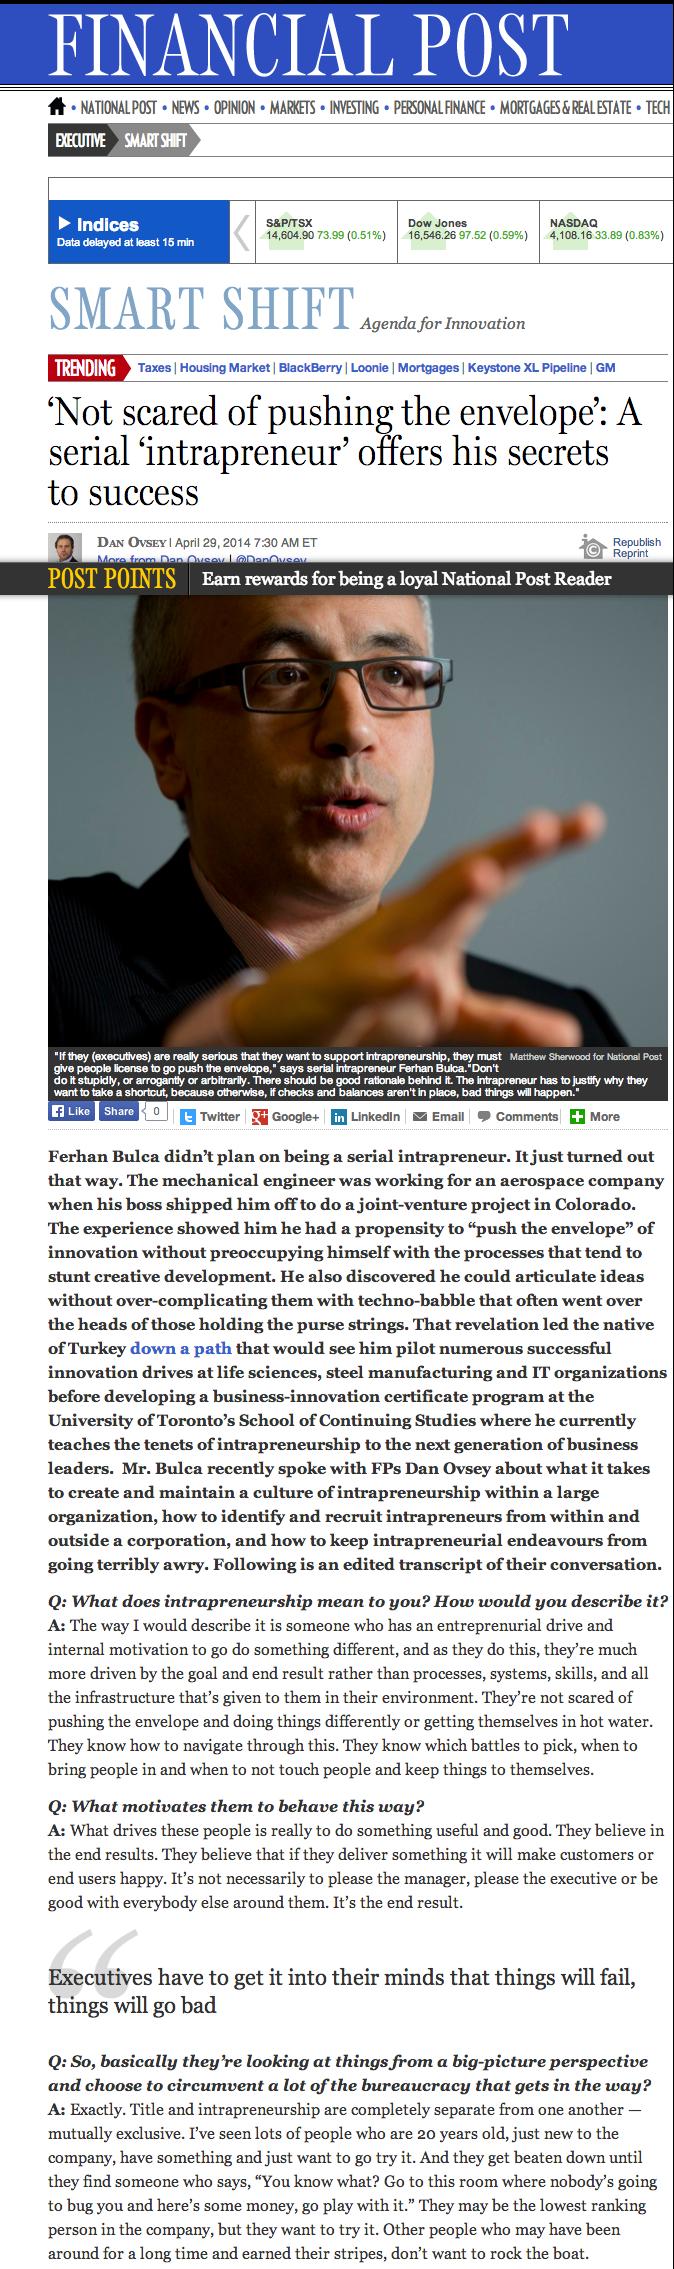 Ferhan Bulca featured in Financial Post